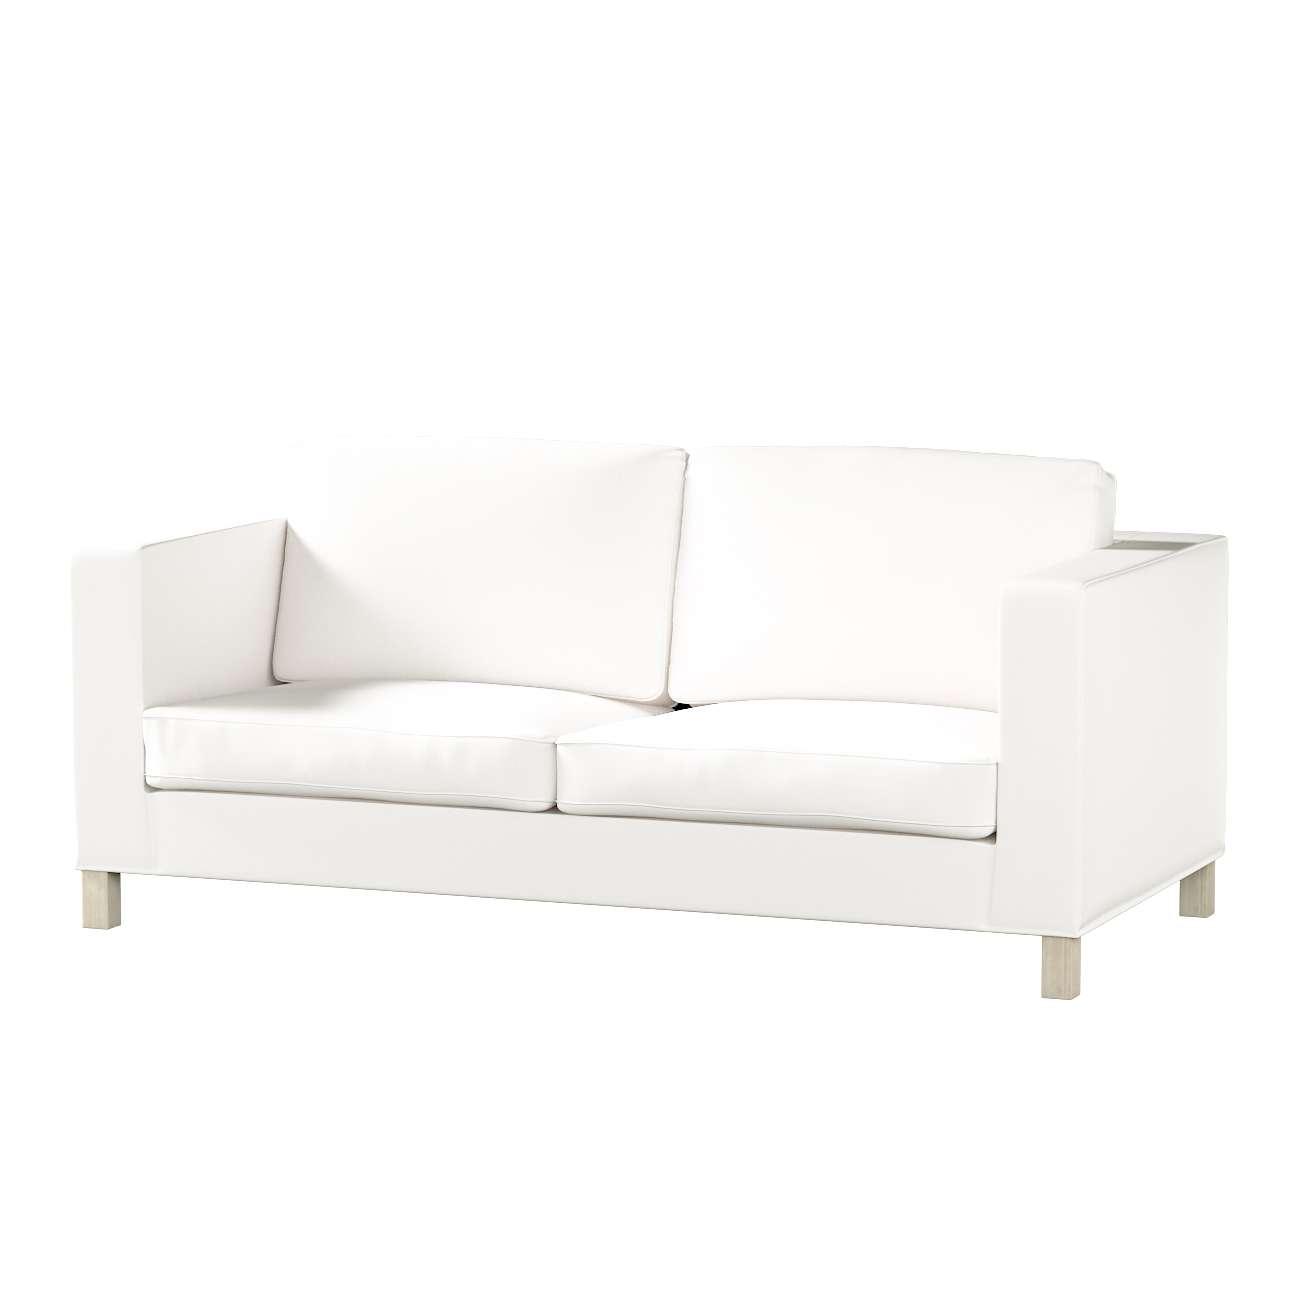 Potah na pohovku IKEA  Karlanda rozkládací, krátký pohovka Karlanda rozkládací v kolekci Cotton Panama, látka: 702-34